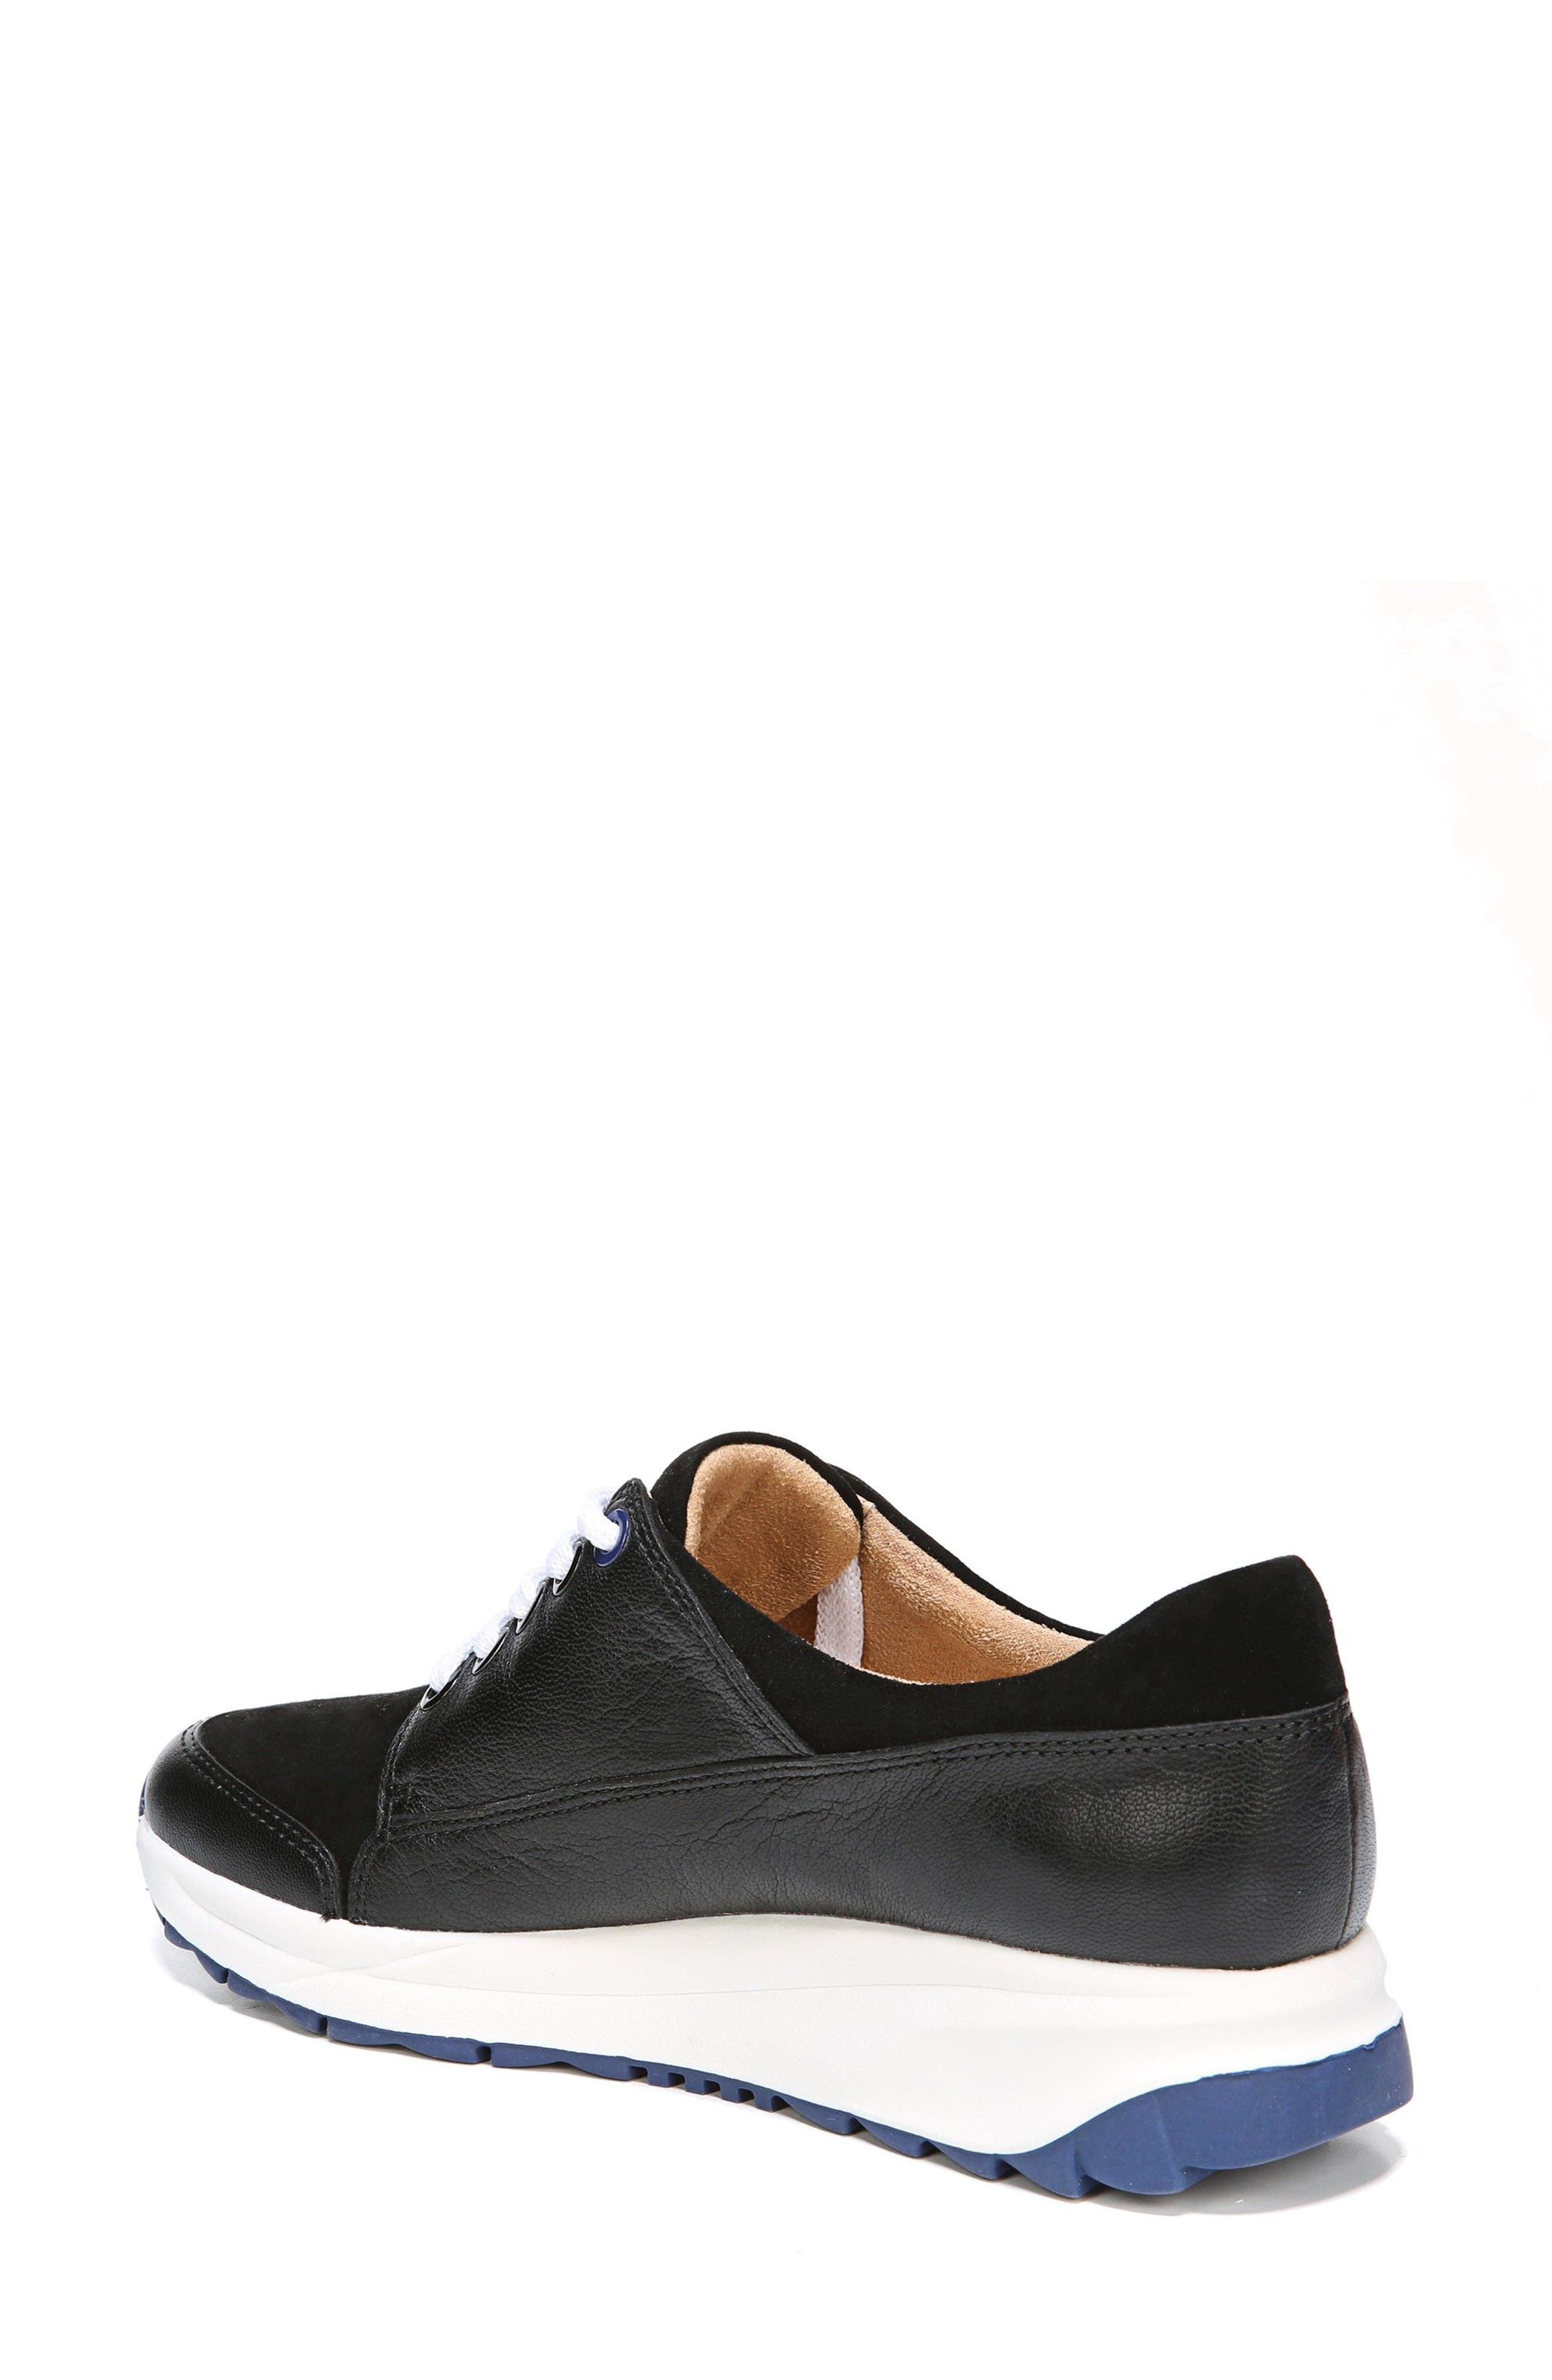 Sabine Sneaker,                             Alternate thumbnail 2, color,                             001